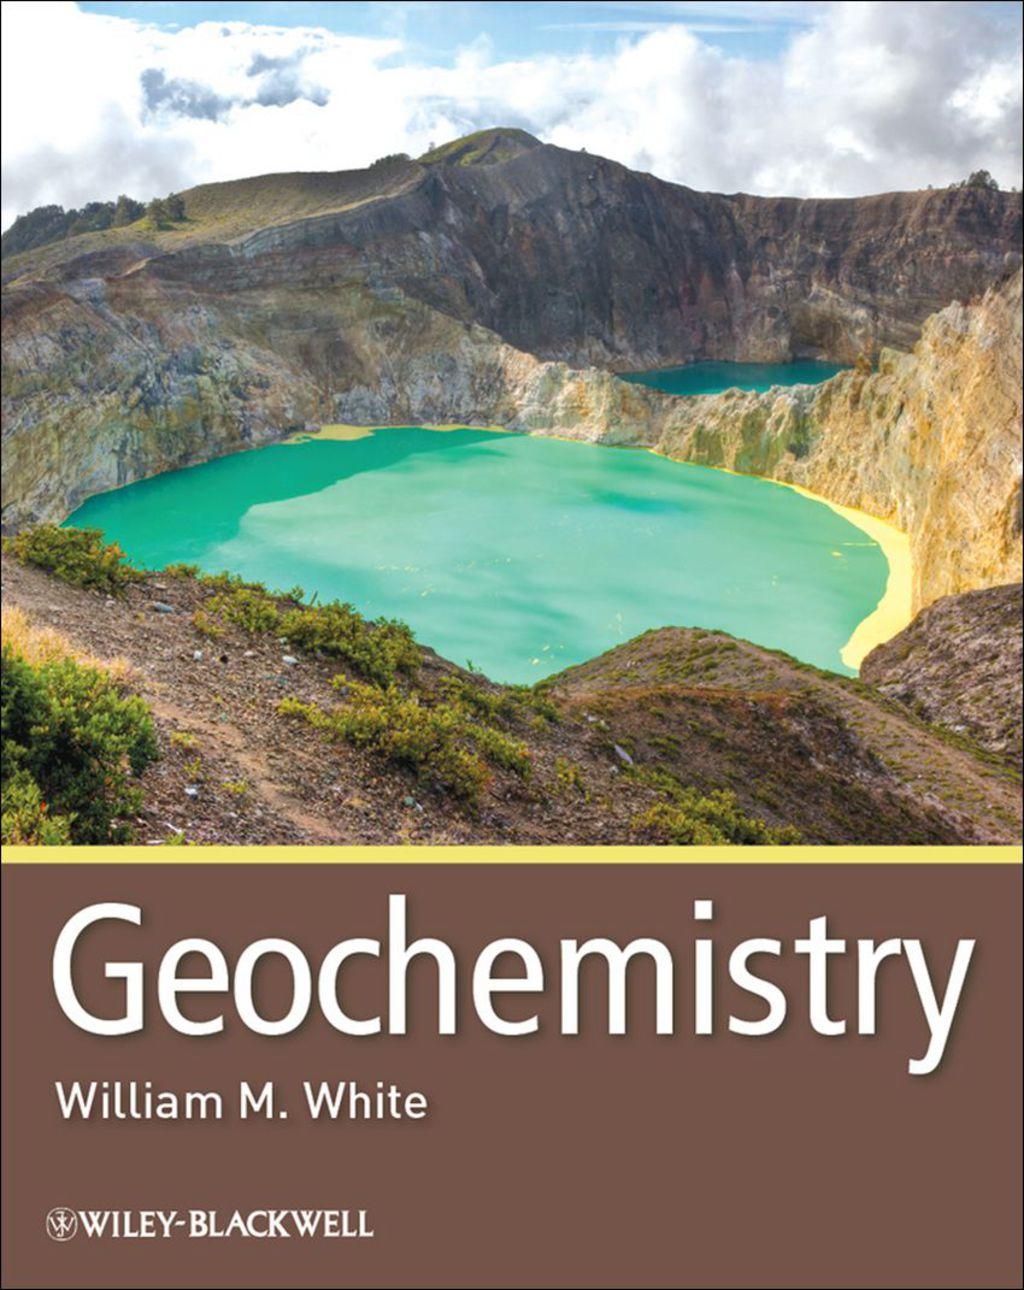 Geochemistry (eBook)